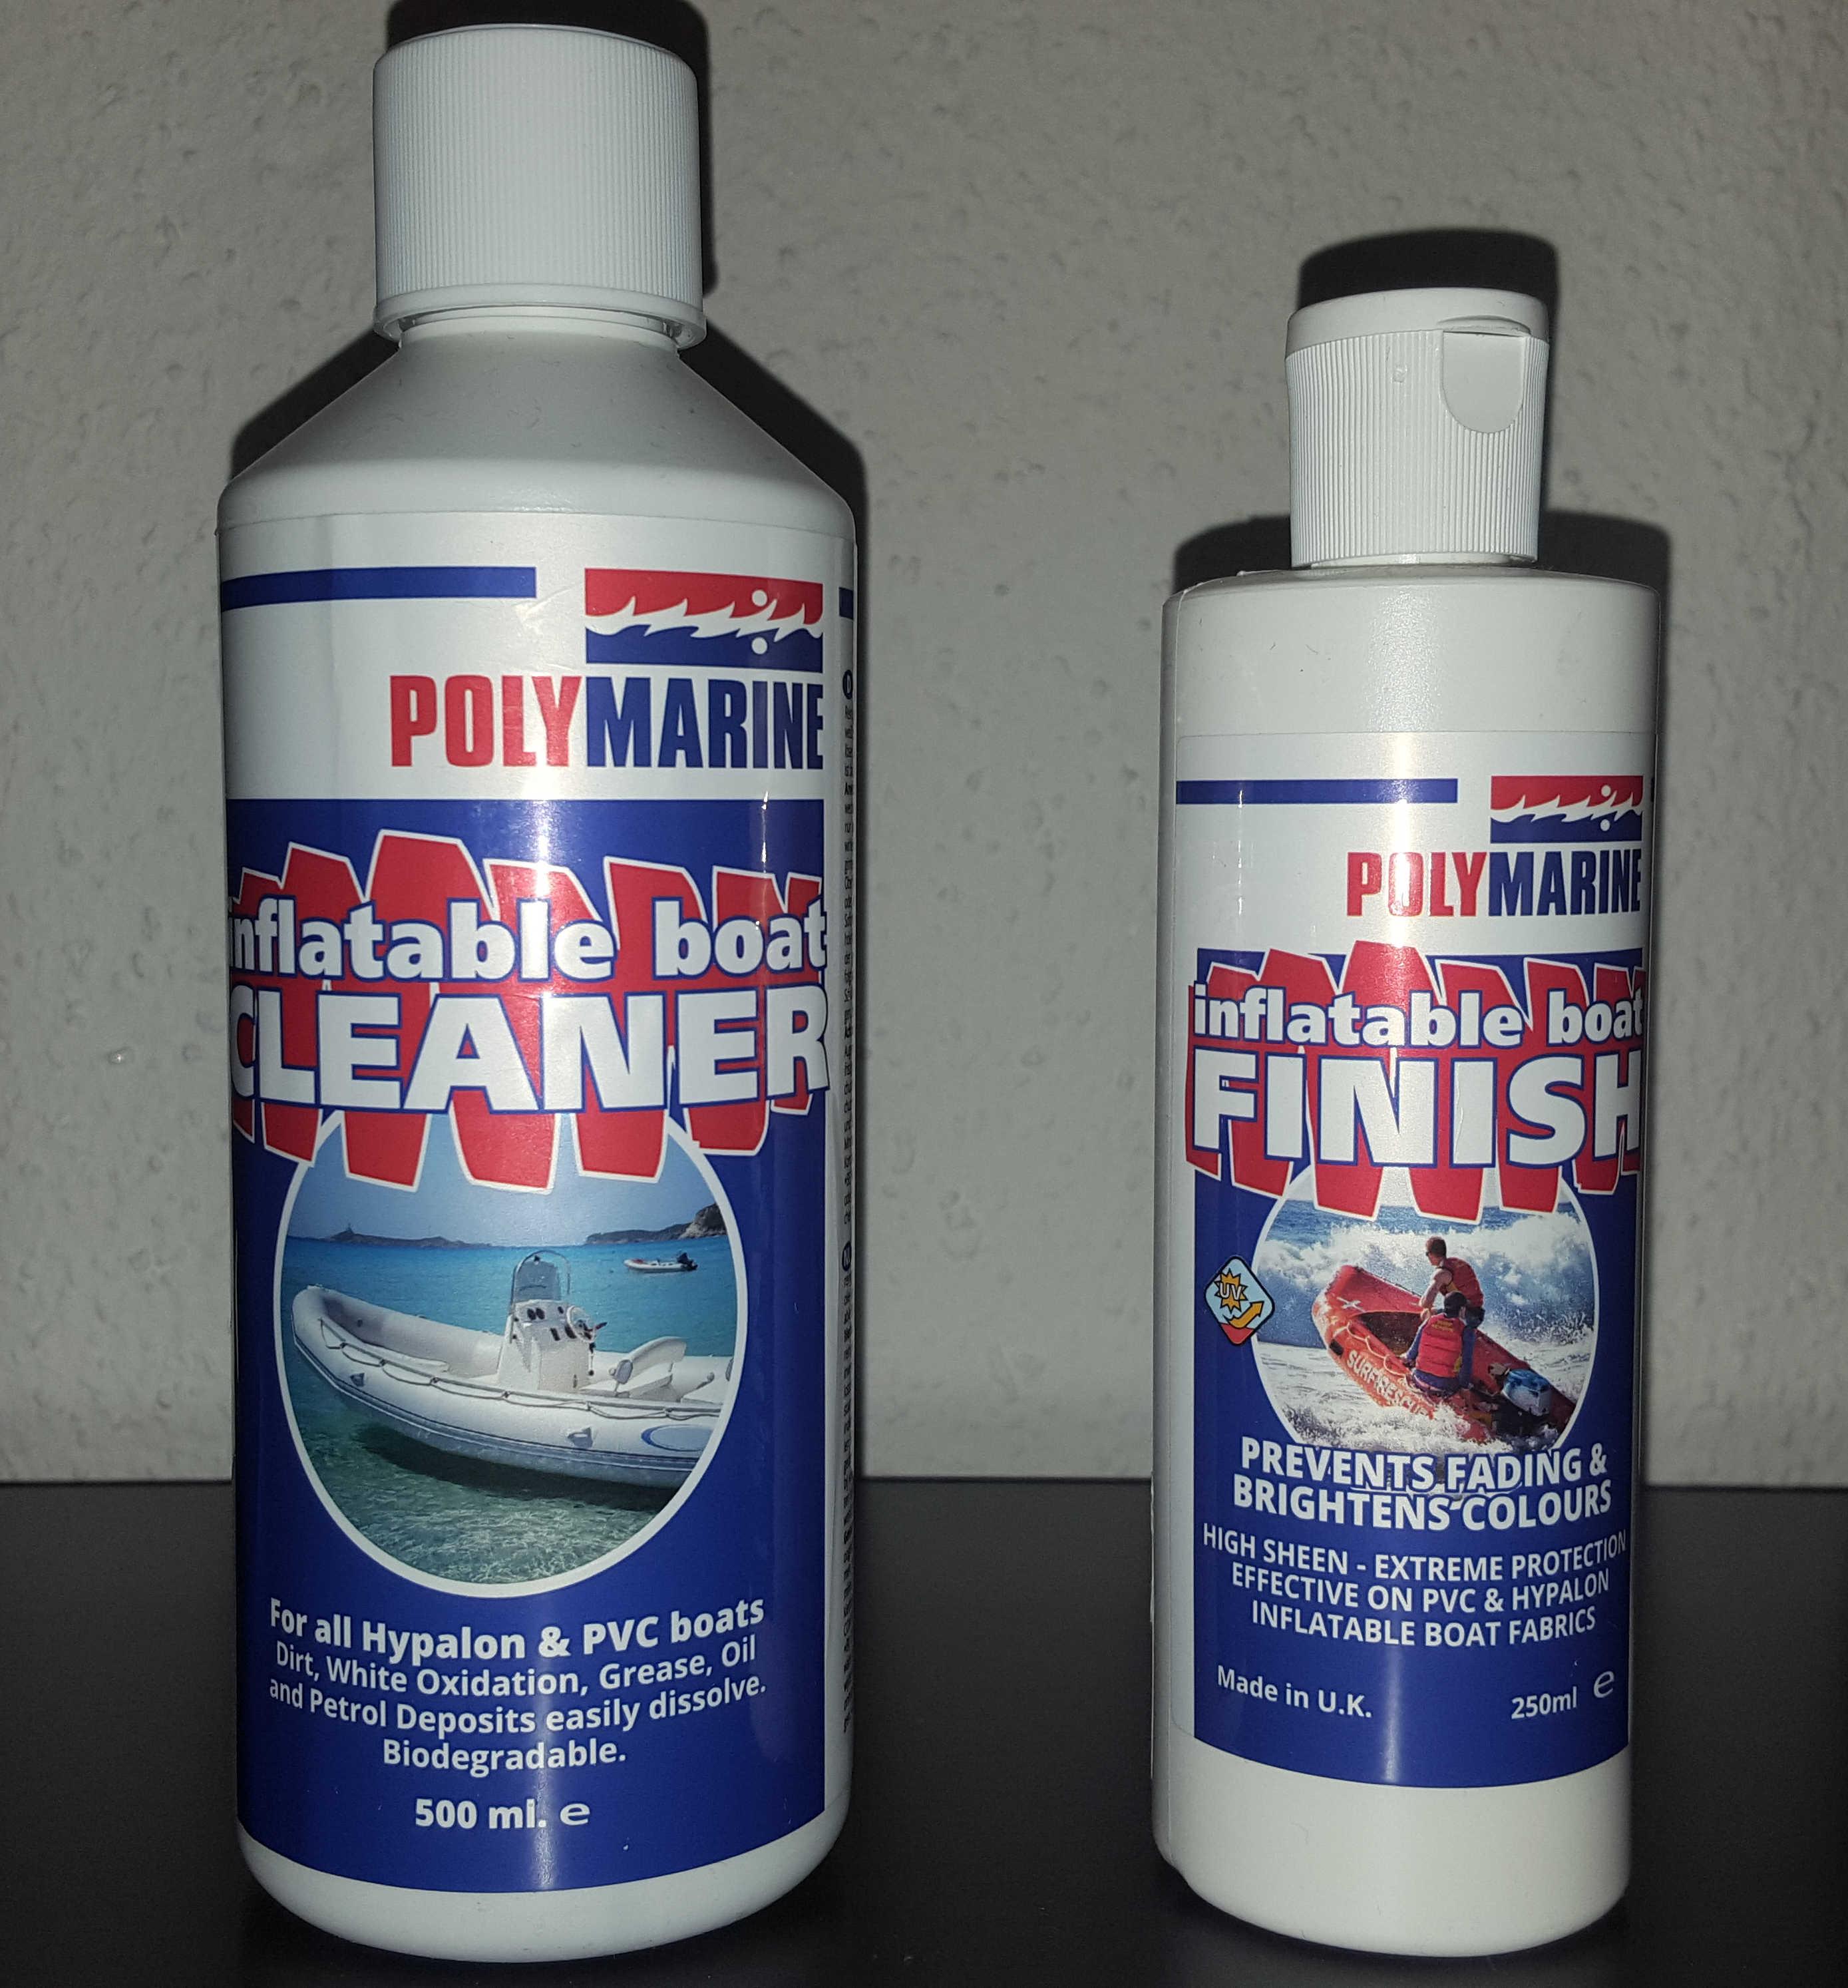 polymarine inflatable boat cleaner und finish sportboot. Black Bedroom Furniture Sets. Home Design Ideas